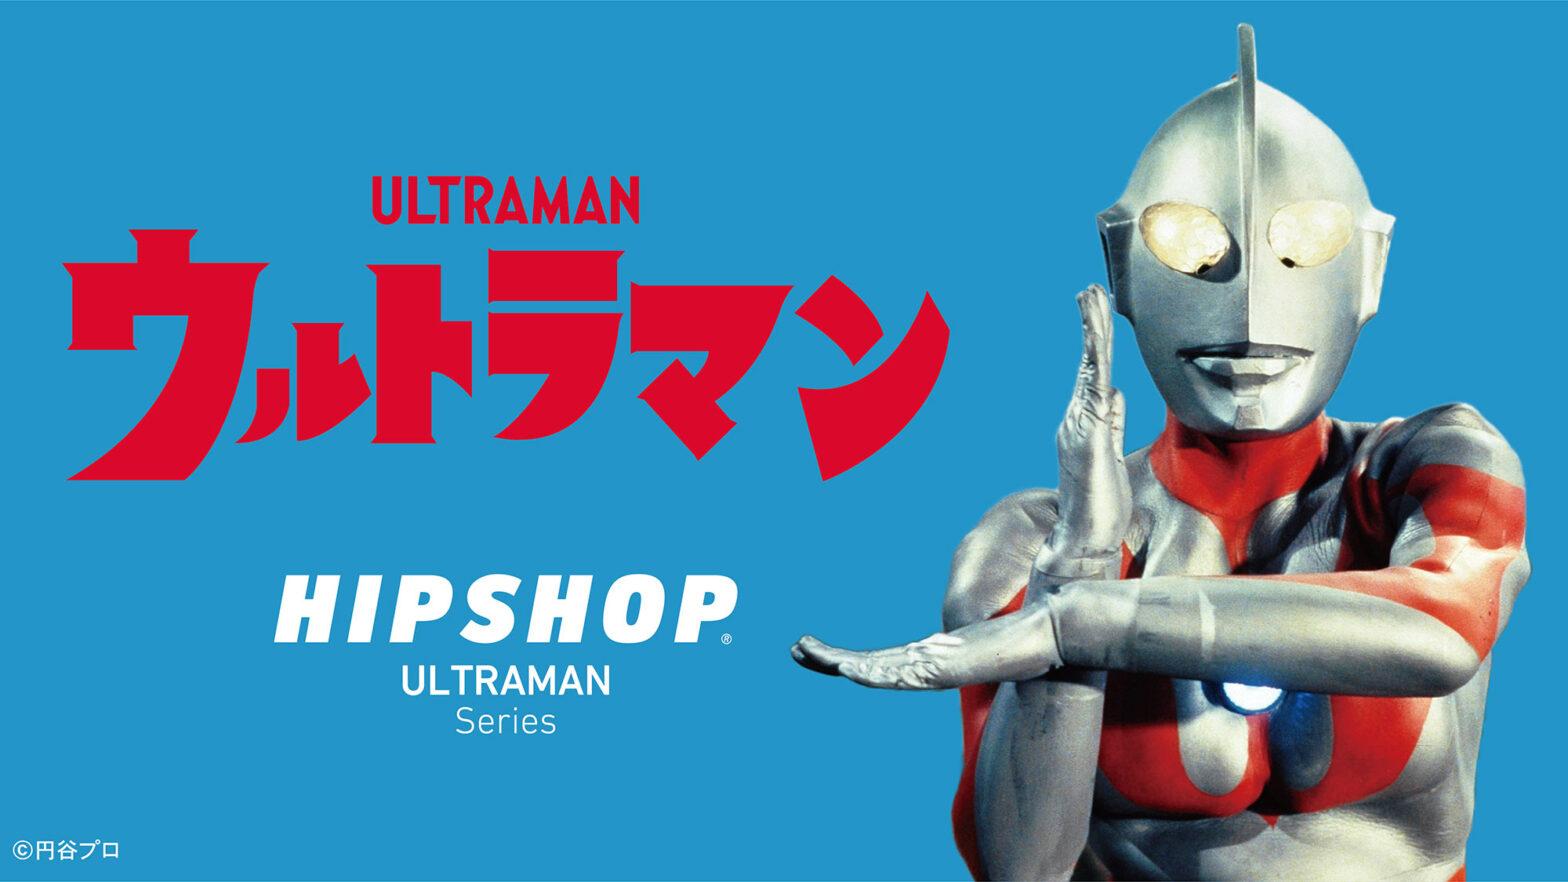 Hipshop Ultraman Series Men's Underwear